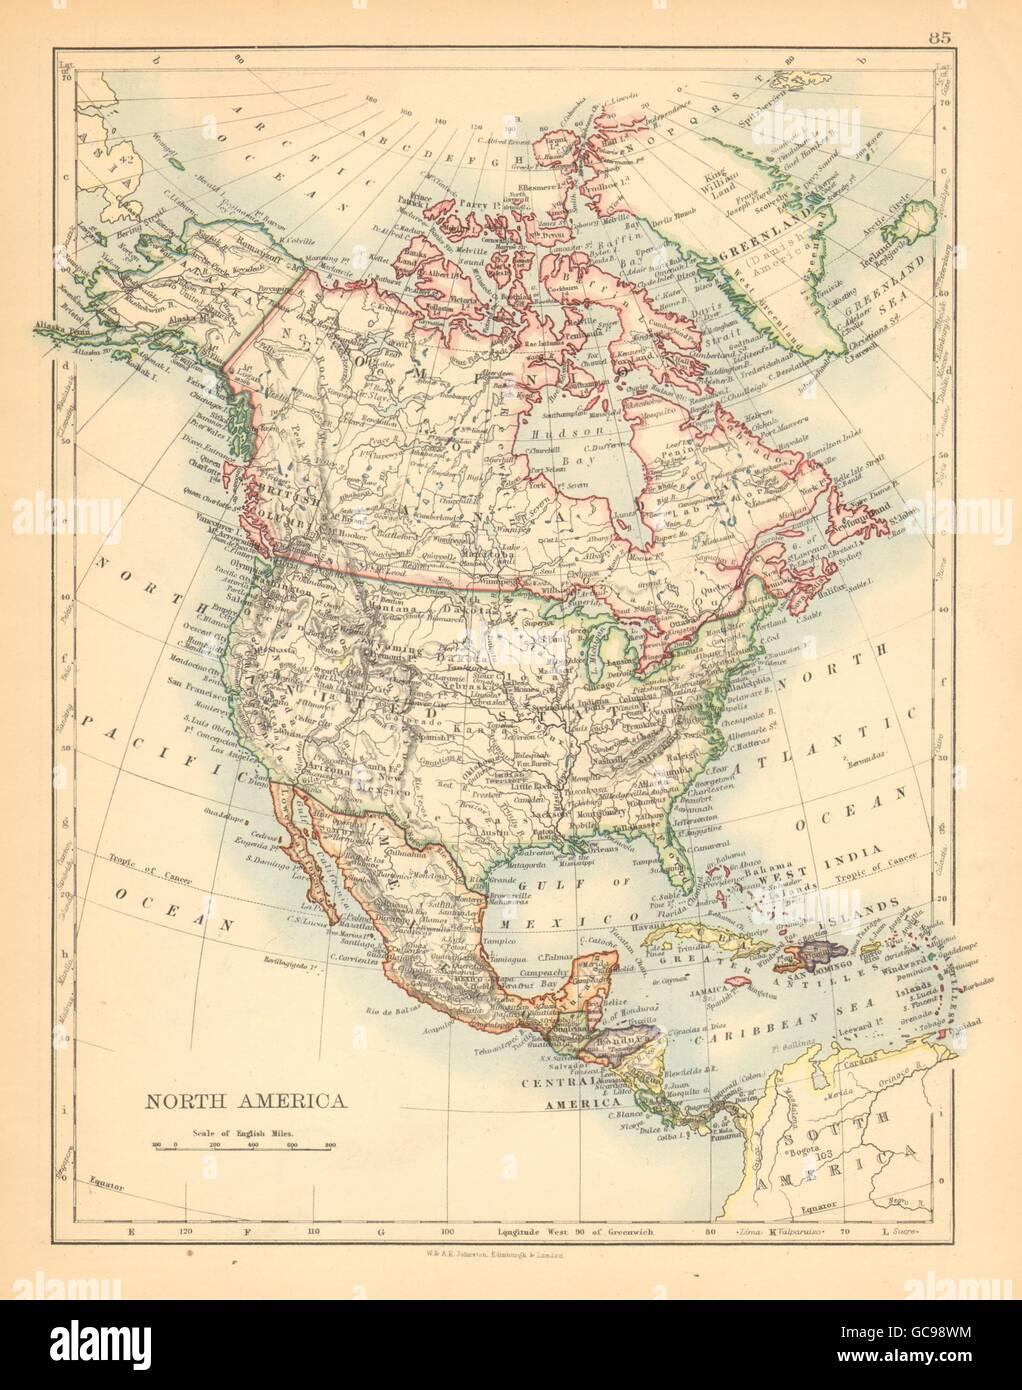 NORTH AMERICA POLITICAL Greenland Danish America USA Canada